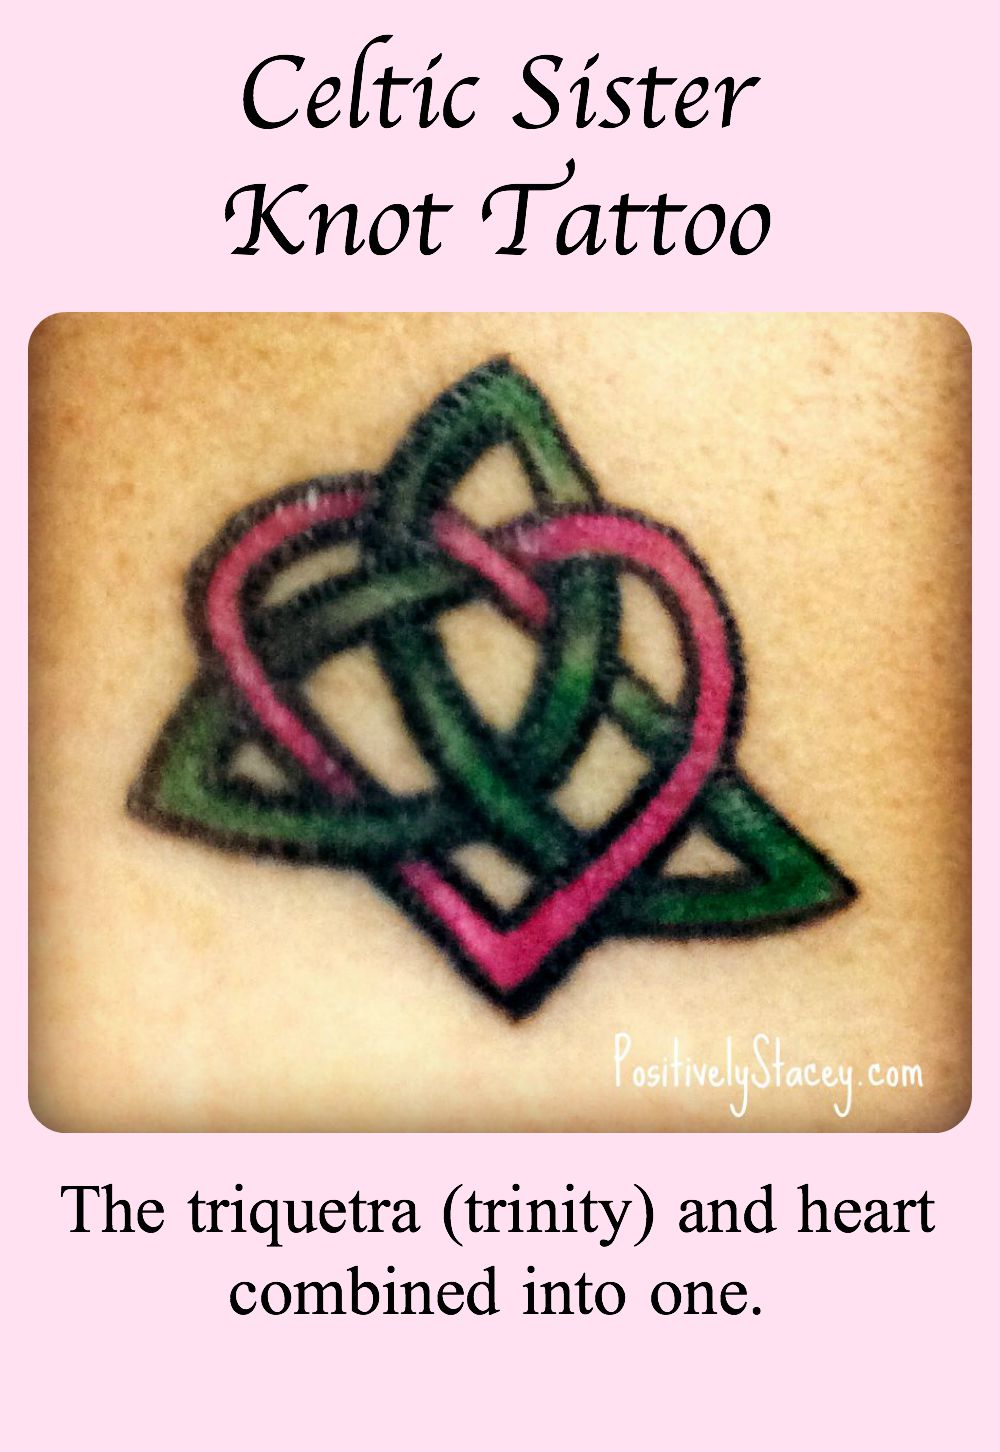 A Celtic Sister Knot Tattoo